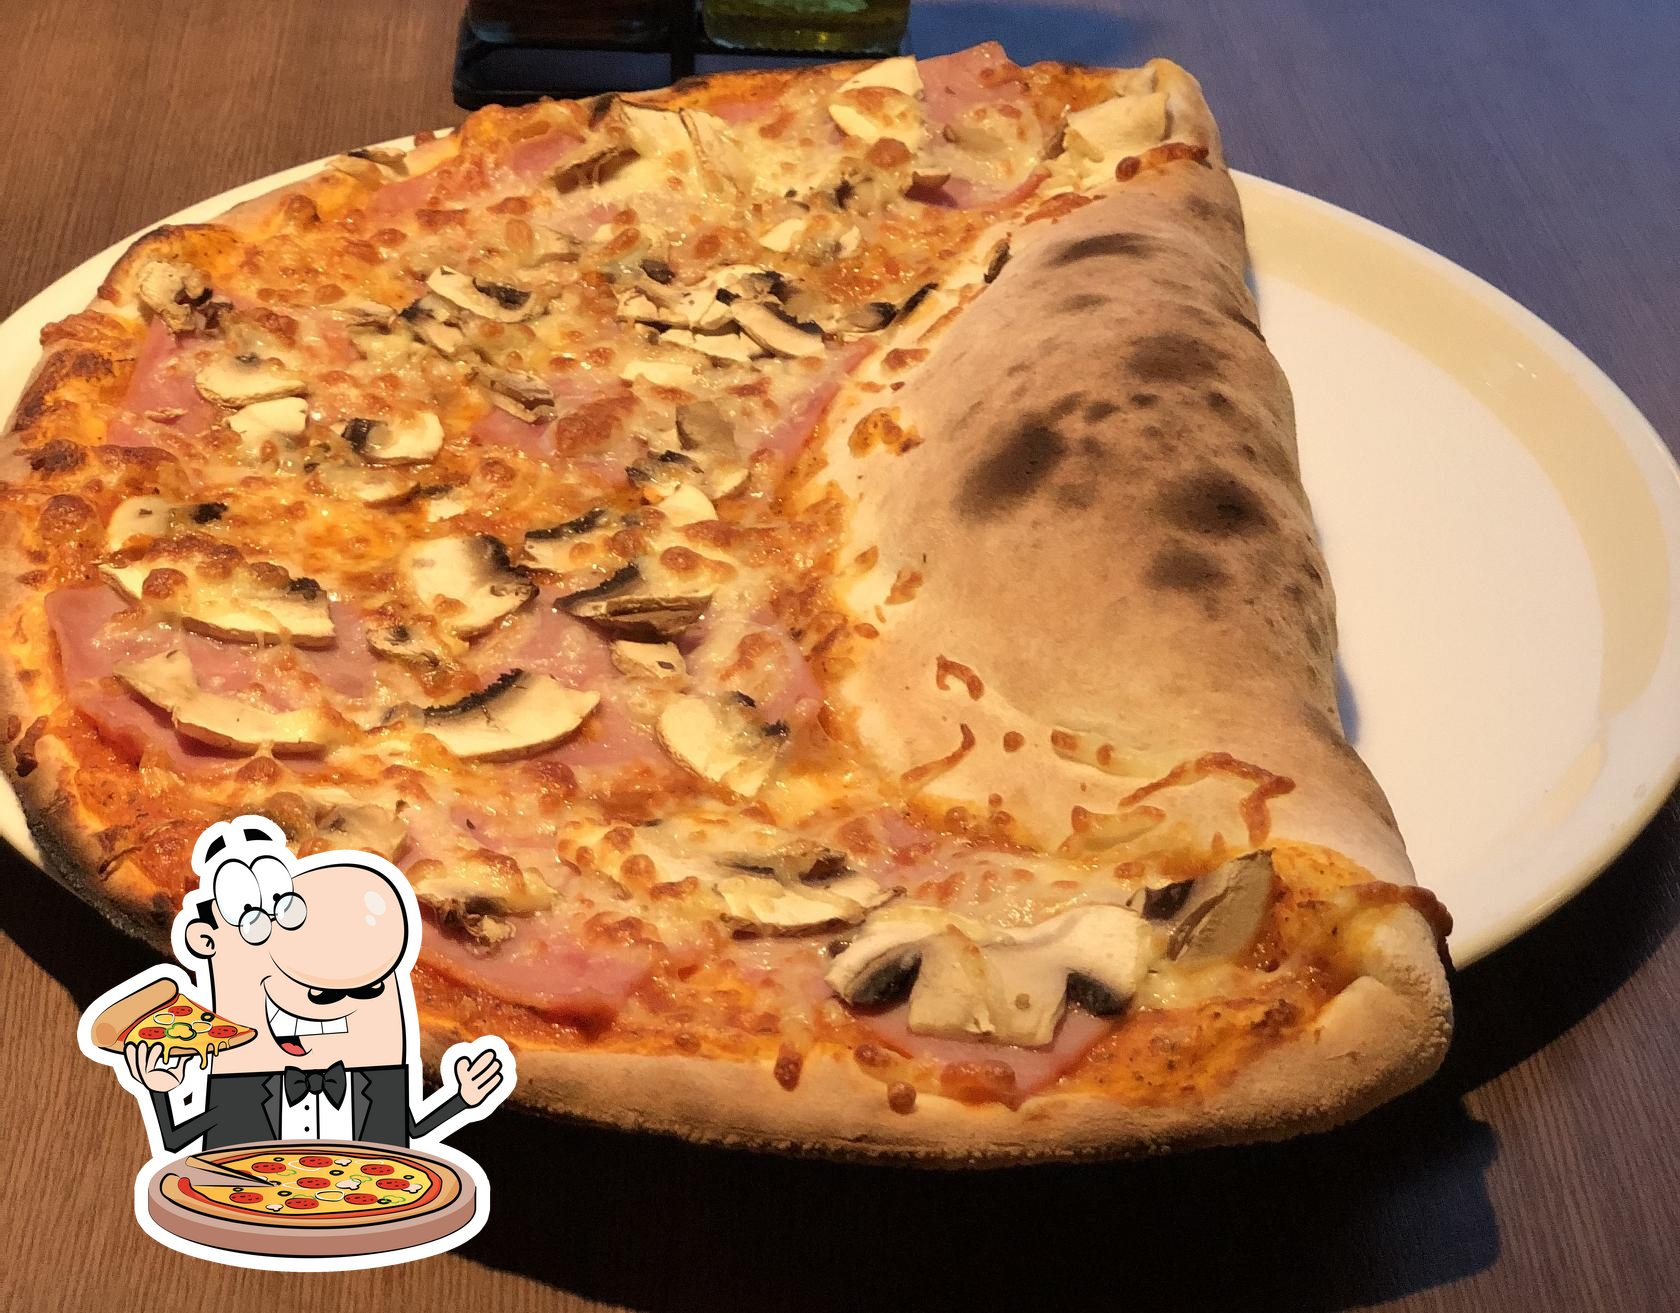 Prueba una pizza en Eldofninn